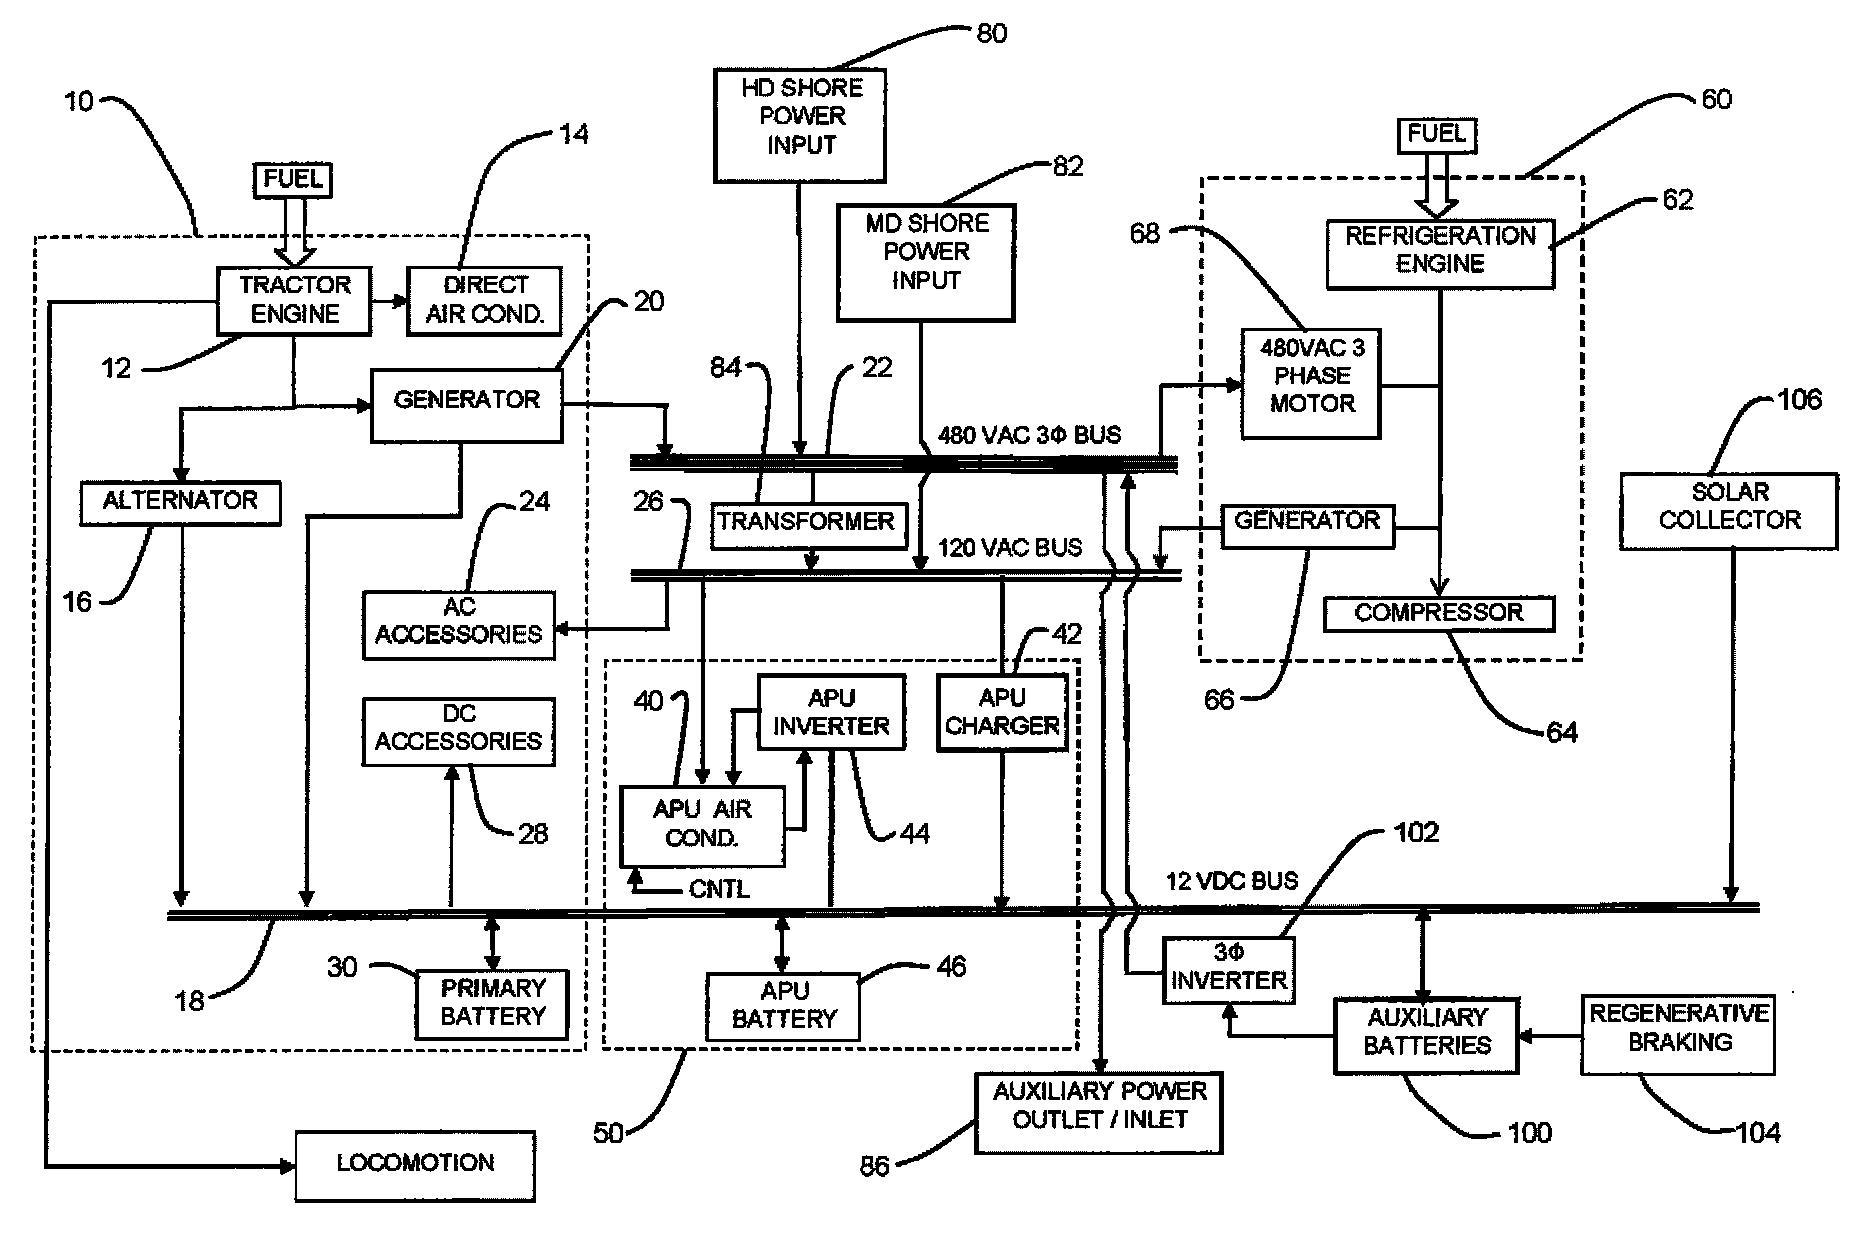 Refrigerated Truck Wiring Diagram Refrigerator Zer Amana